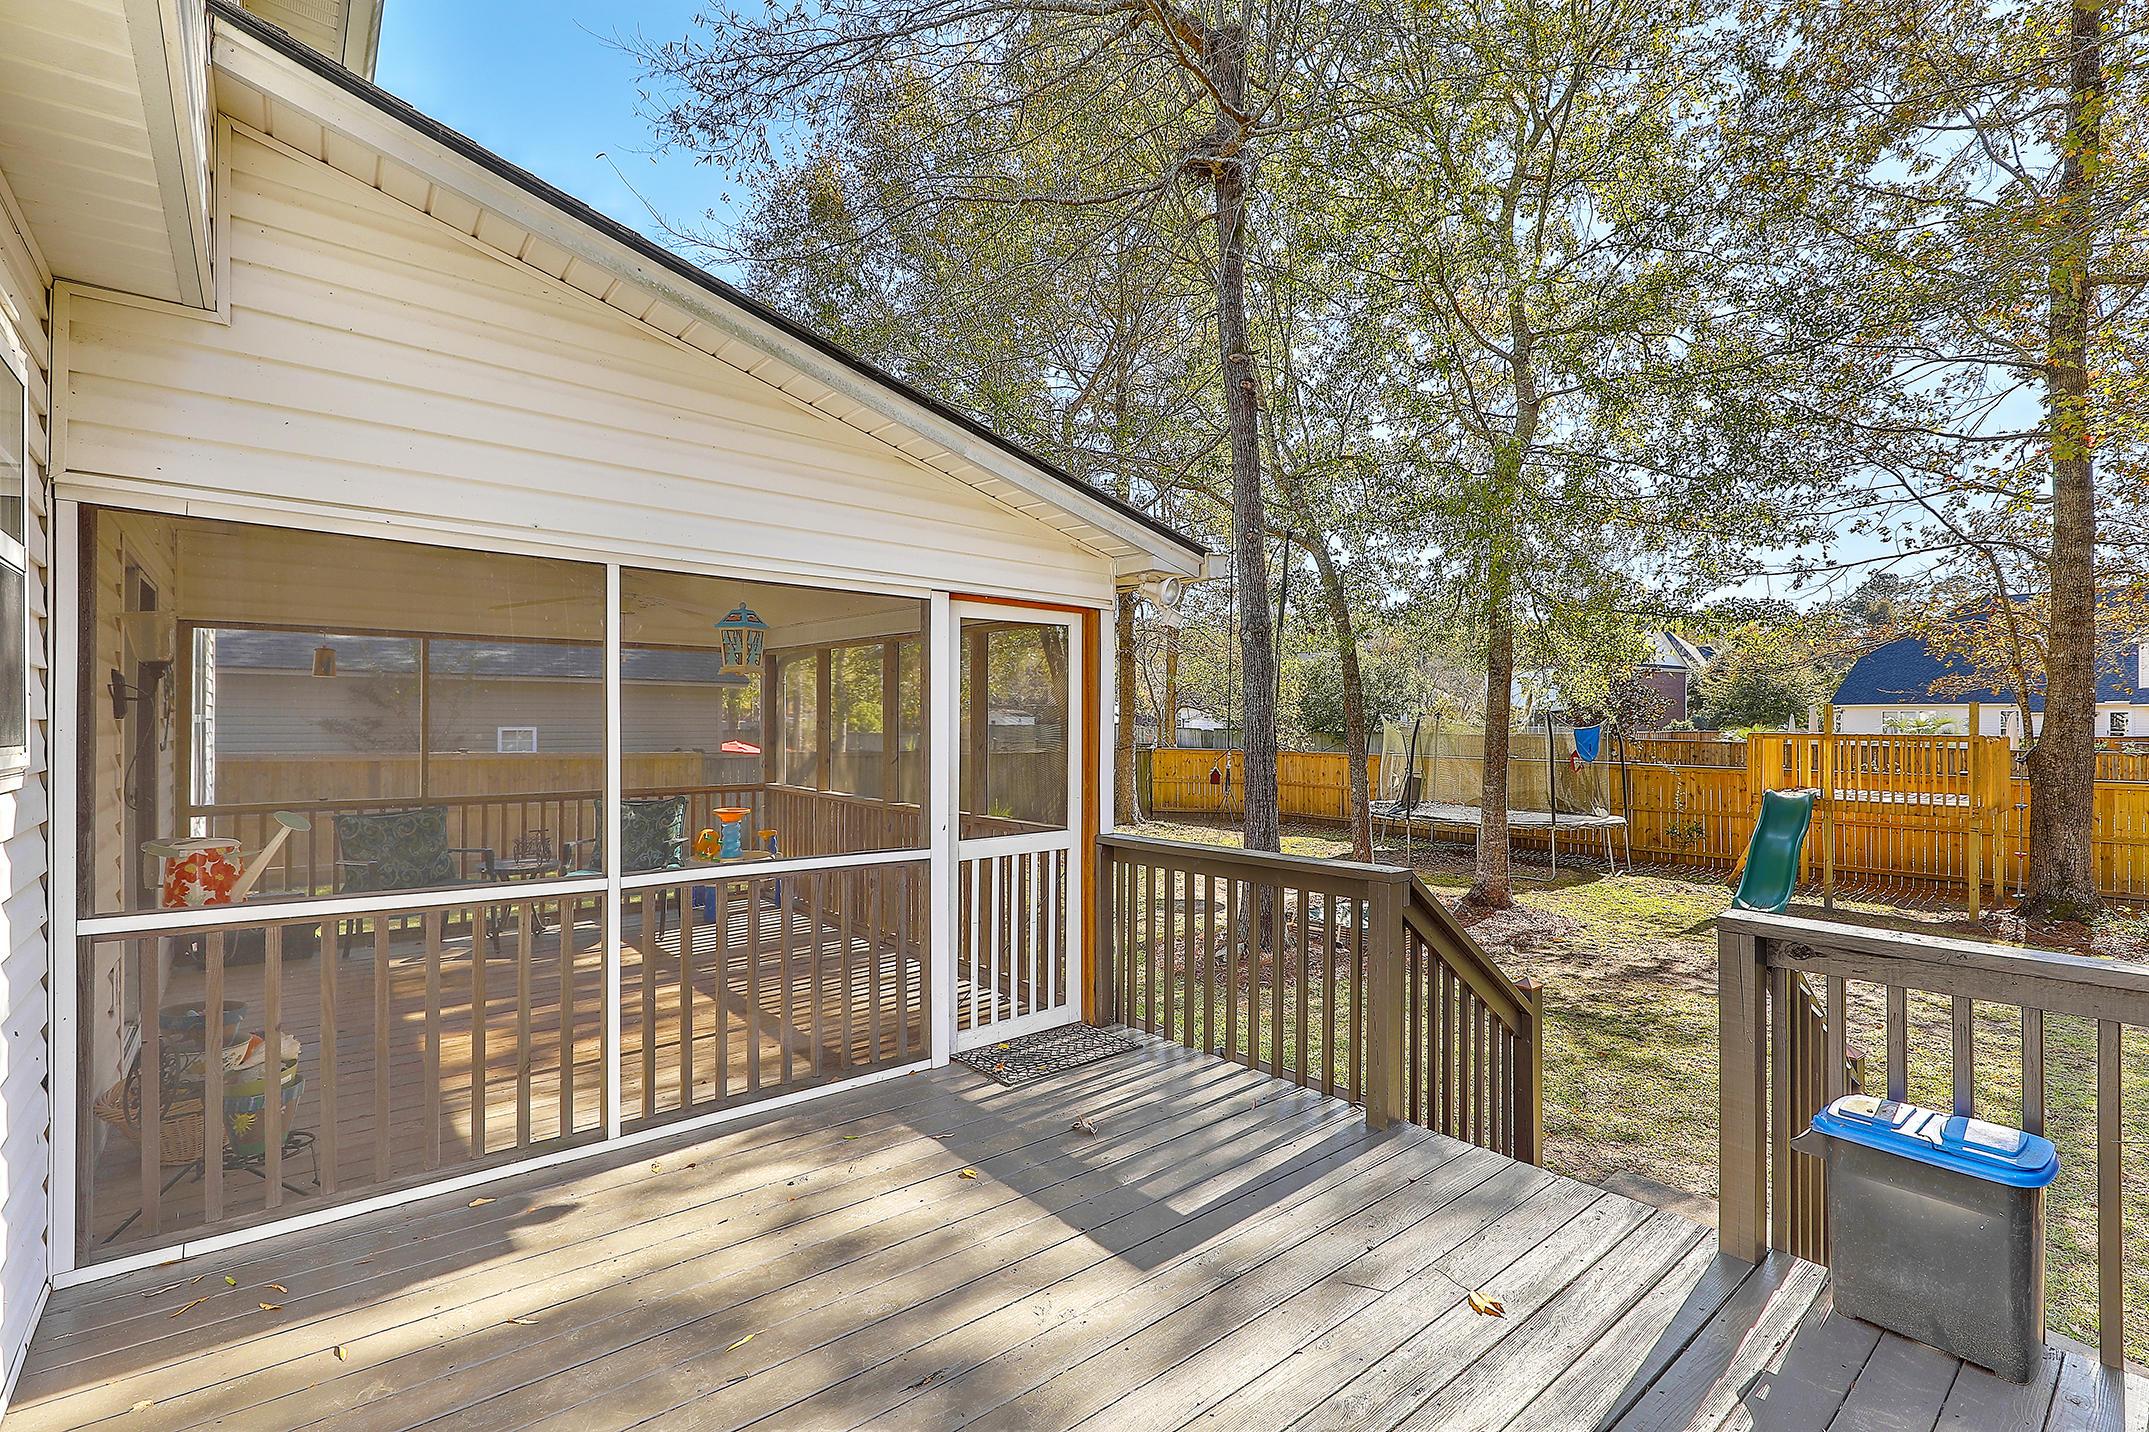 Crowfield Plantation Homes For Sale - 104 Jamesford, Goose Creek, SC - 23